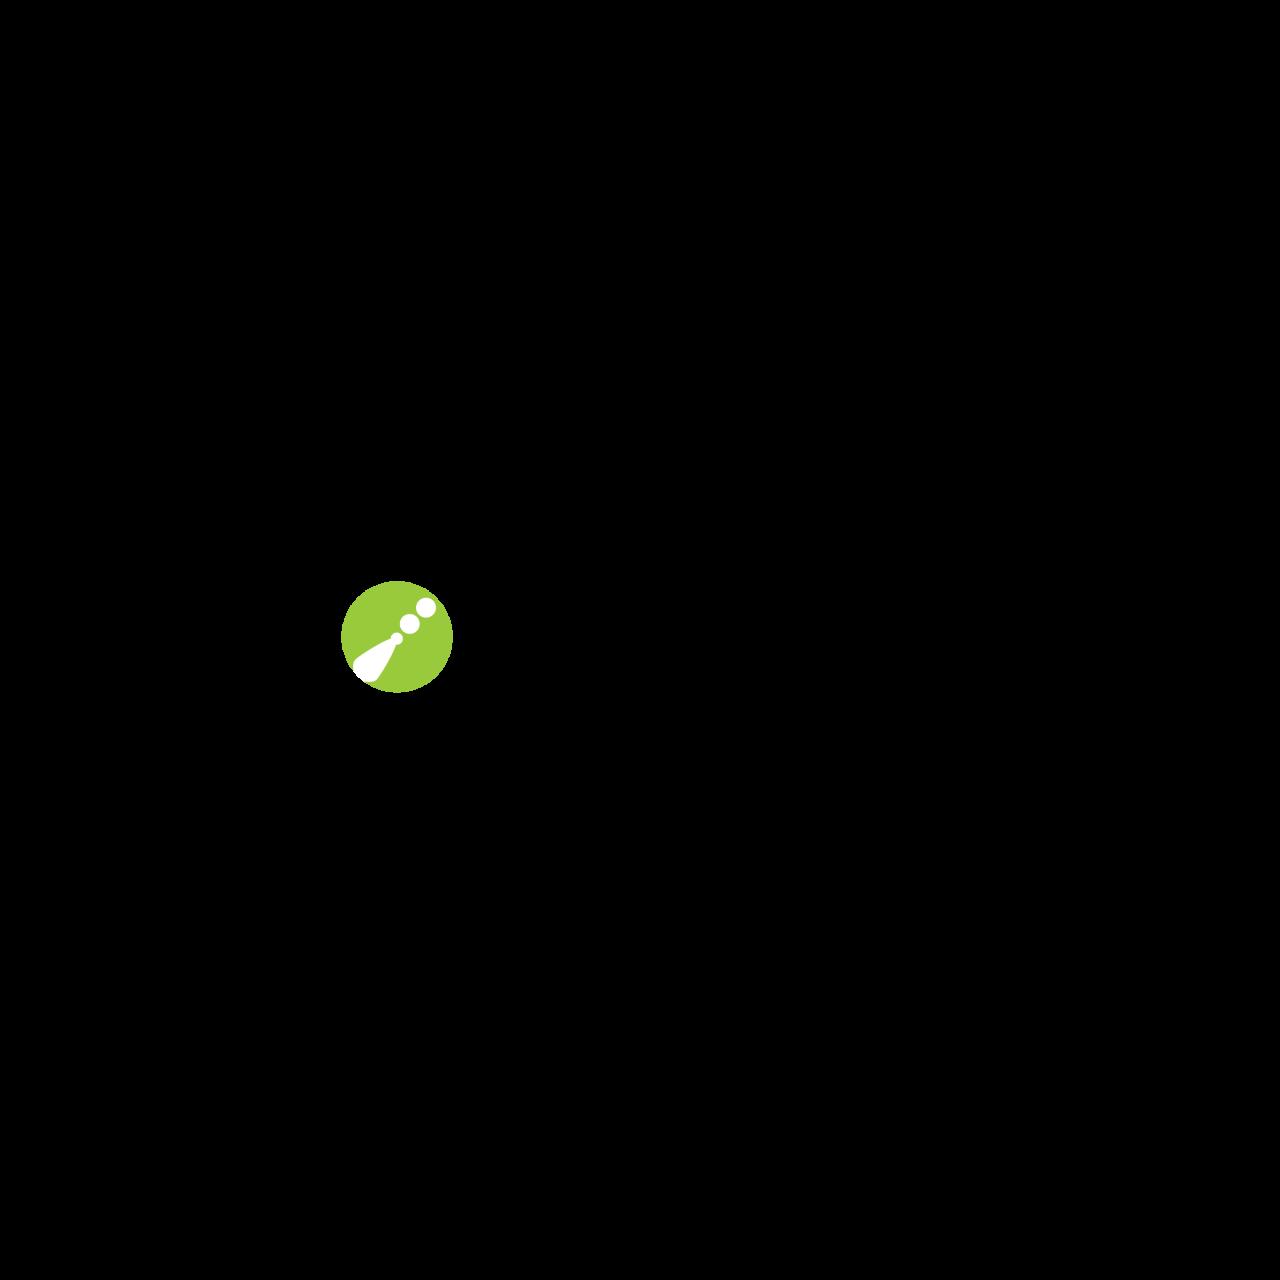 Image of Sporometrics logo